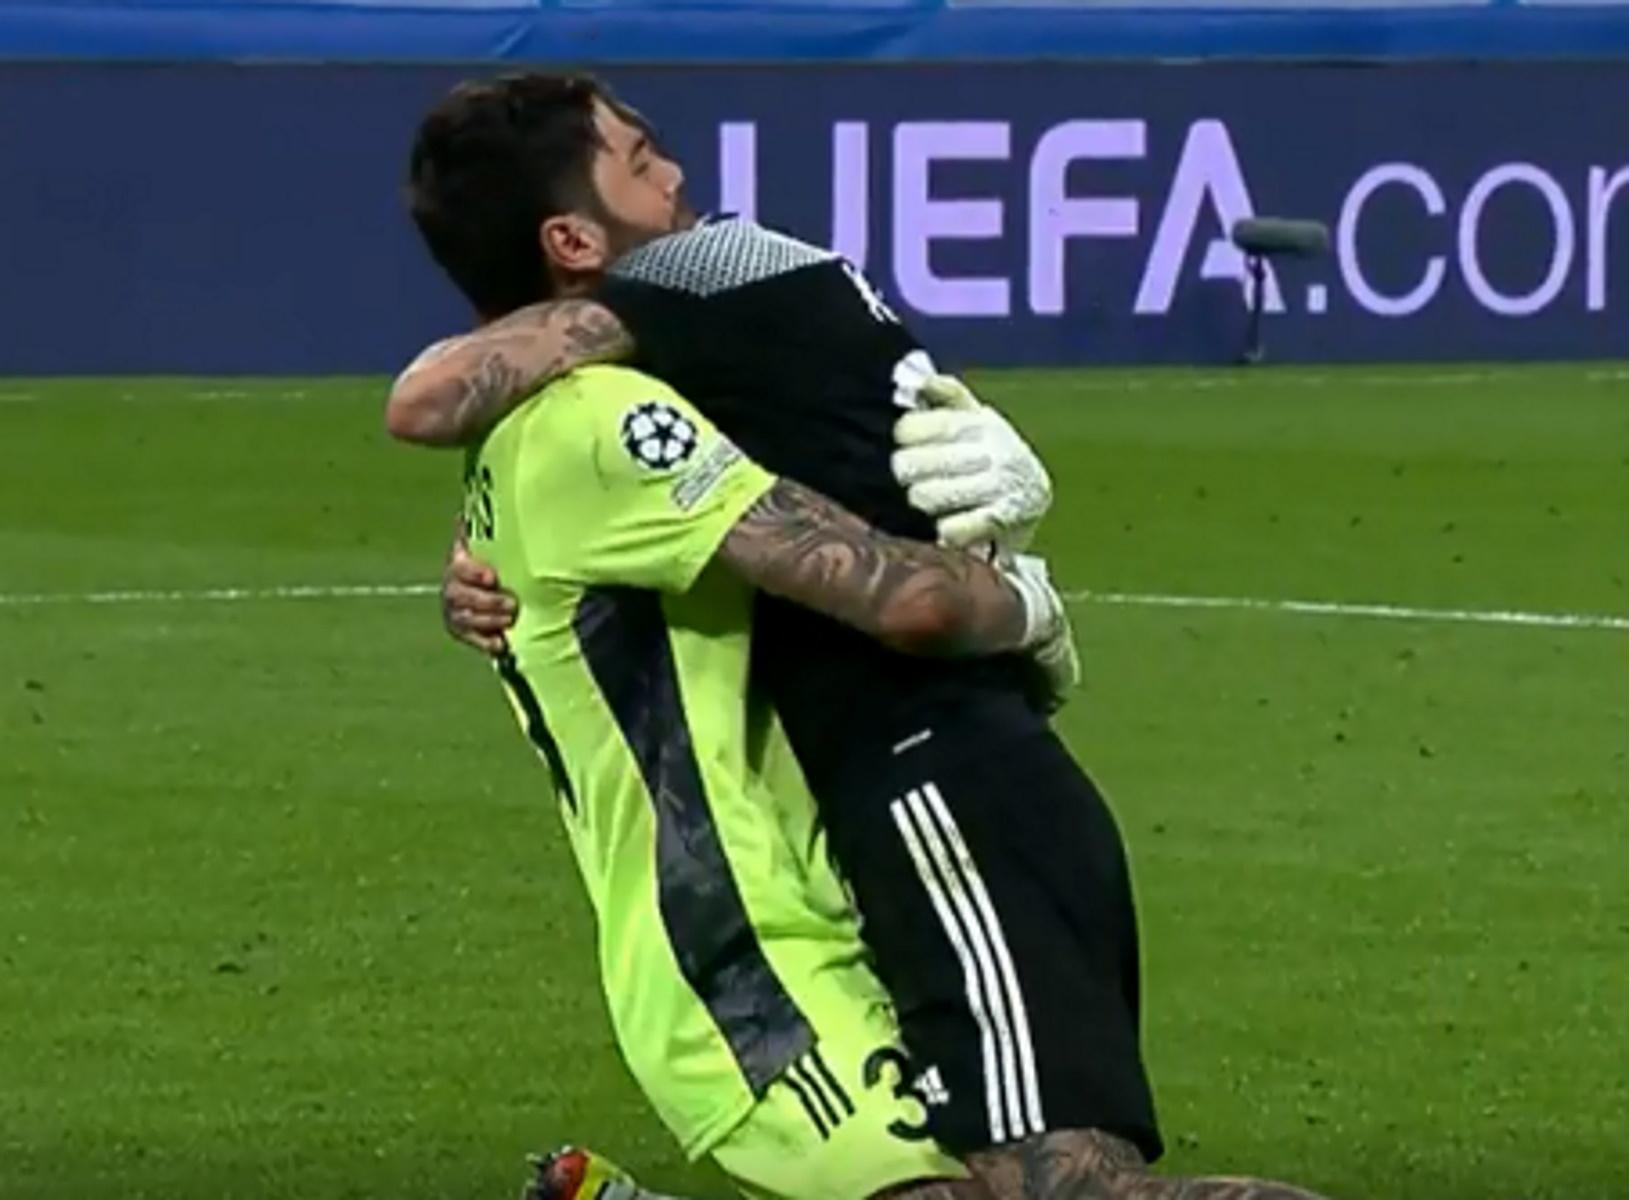 Champions League: Η αγκαλιά Αθανασιάδη-Κολοβού και η αφιέρωση του MVP στη σύντροφό του